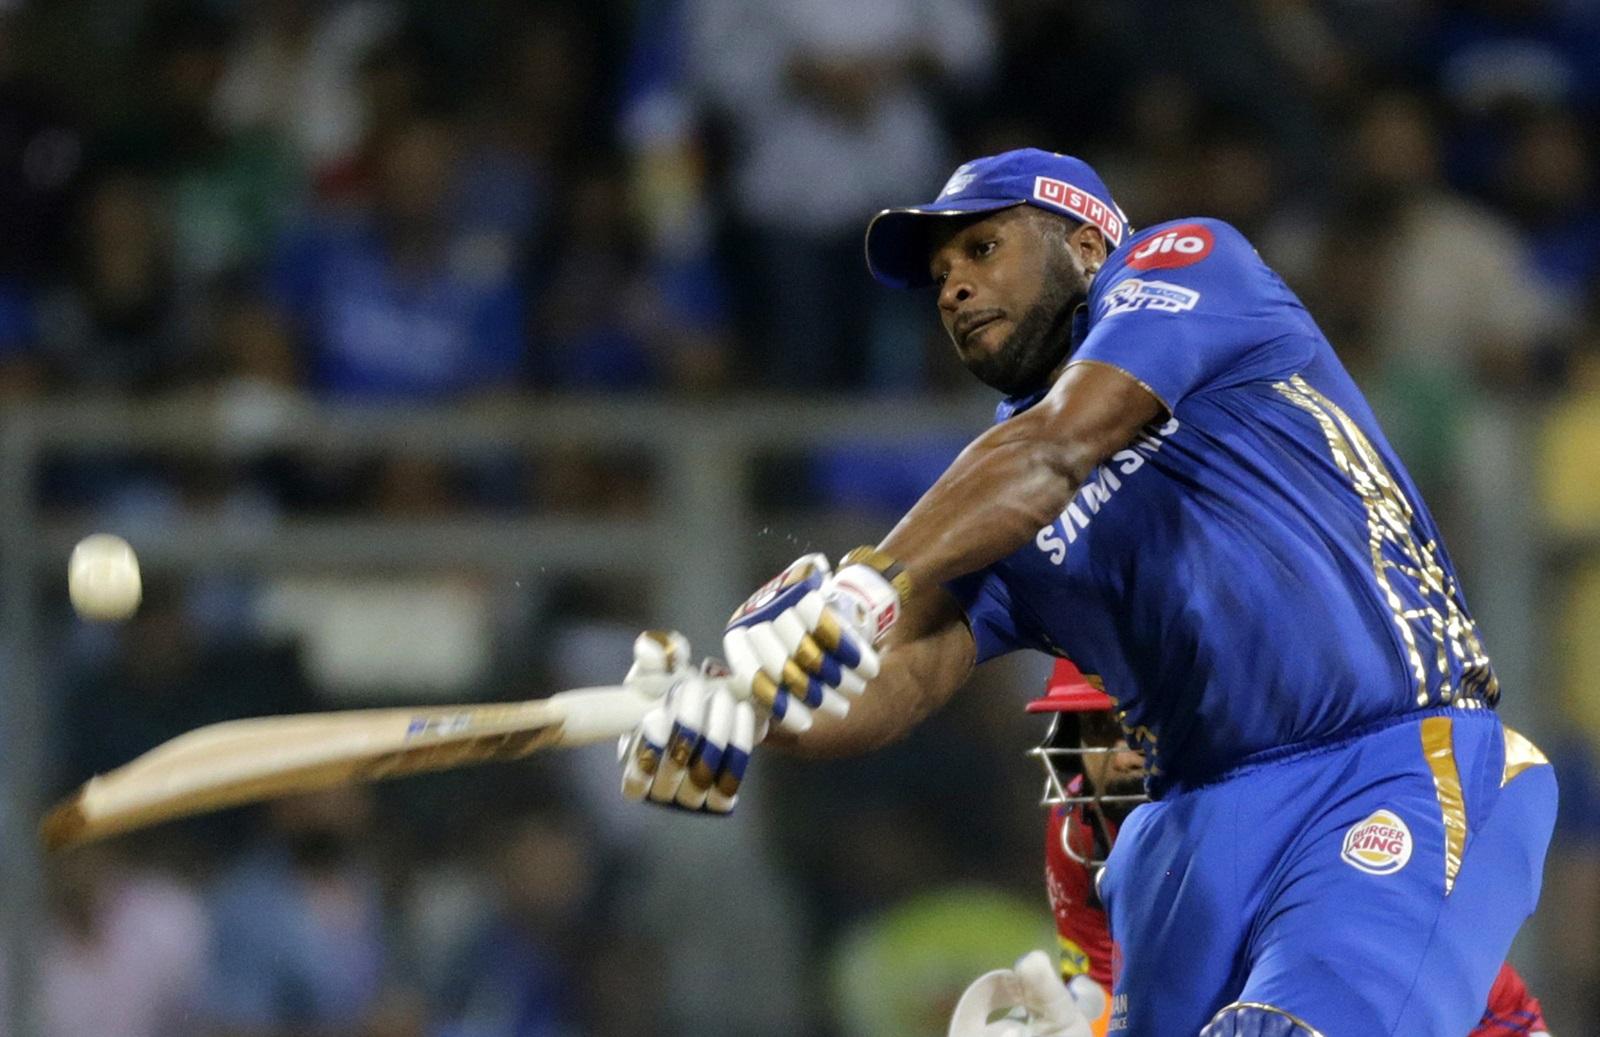 Pollard pulls off miracle for Mumbai | cricket.com.au